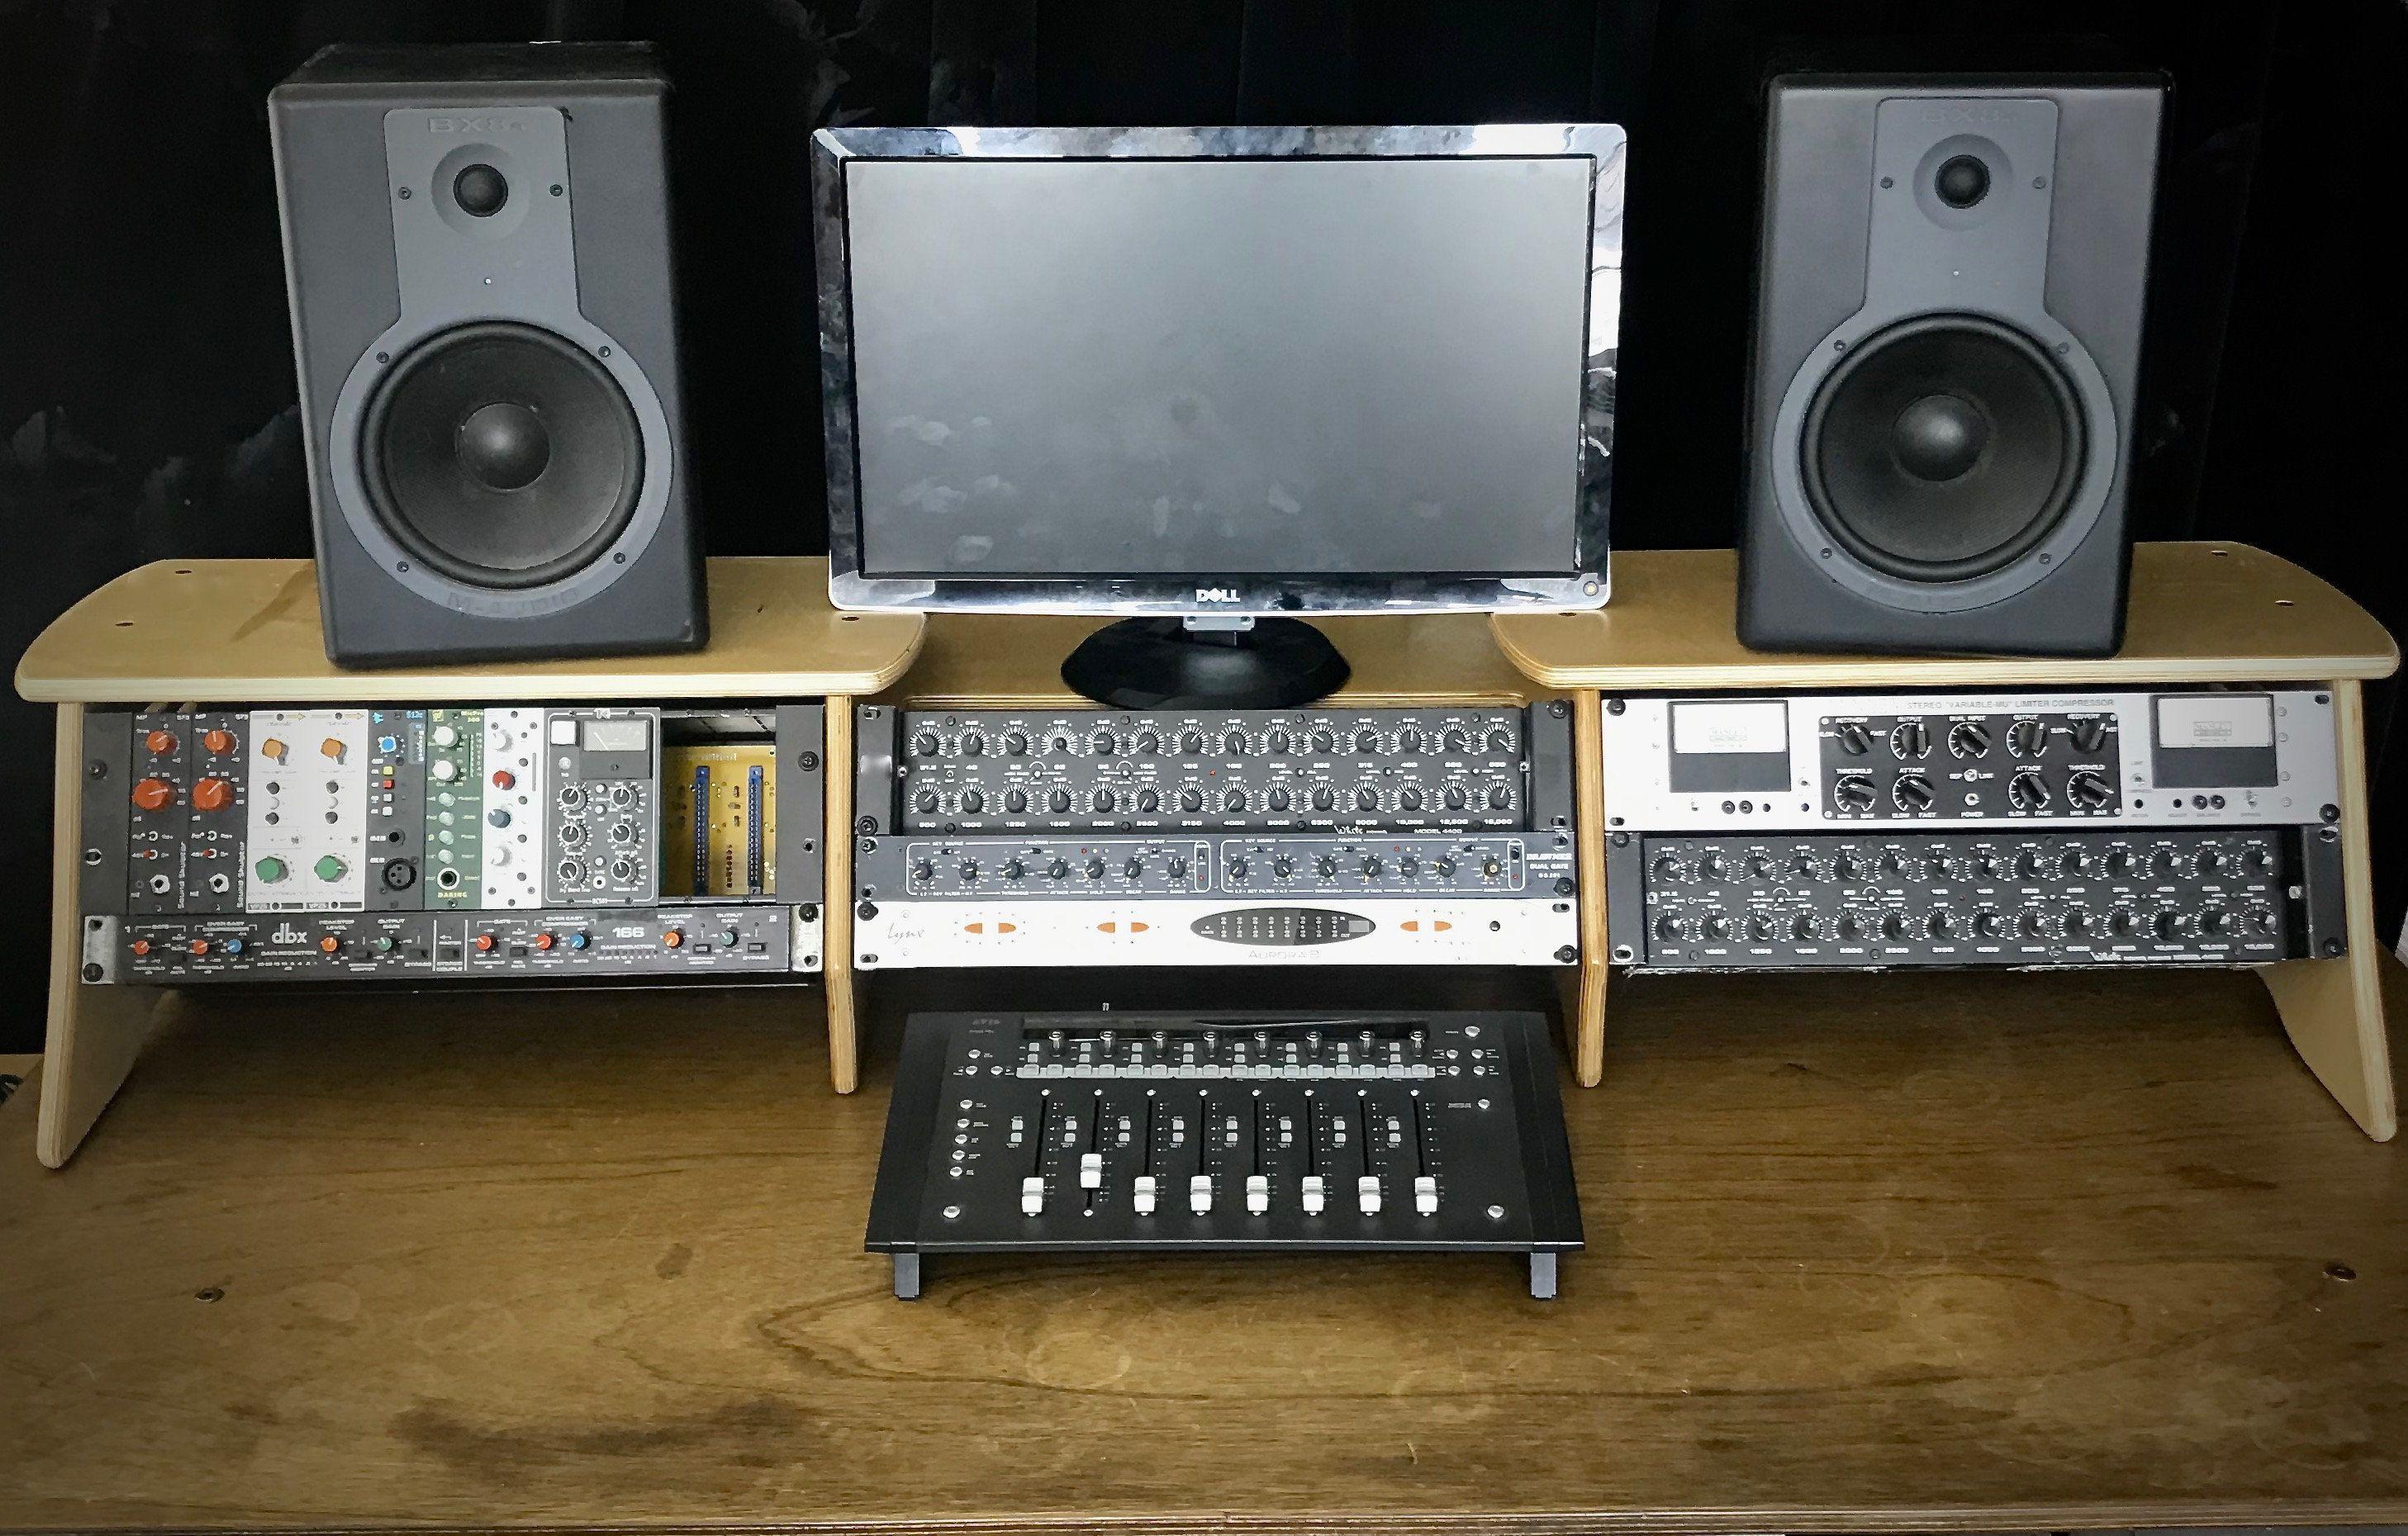 12u Recording Studio Desk Rack System 12u Studio Rack Rack Gear Pro Audio Desk Baltic Birch Rack Rail Recording Studio Desk Studio Desk Recording Studio